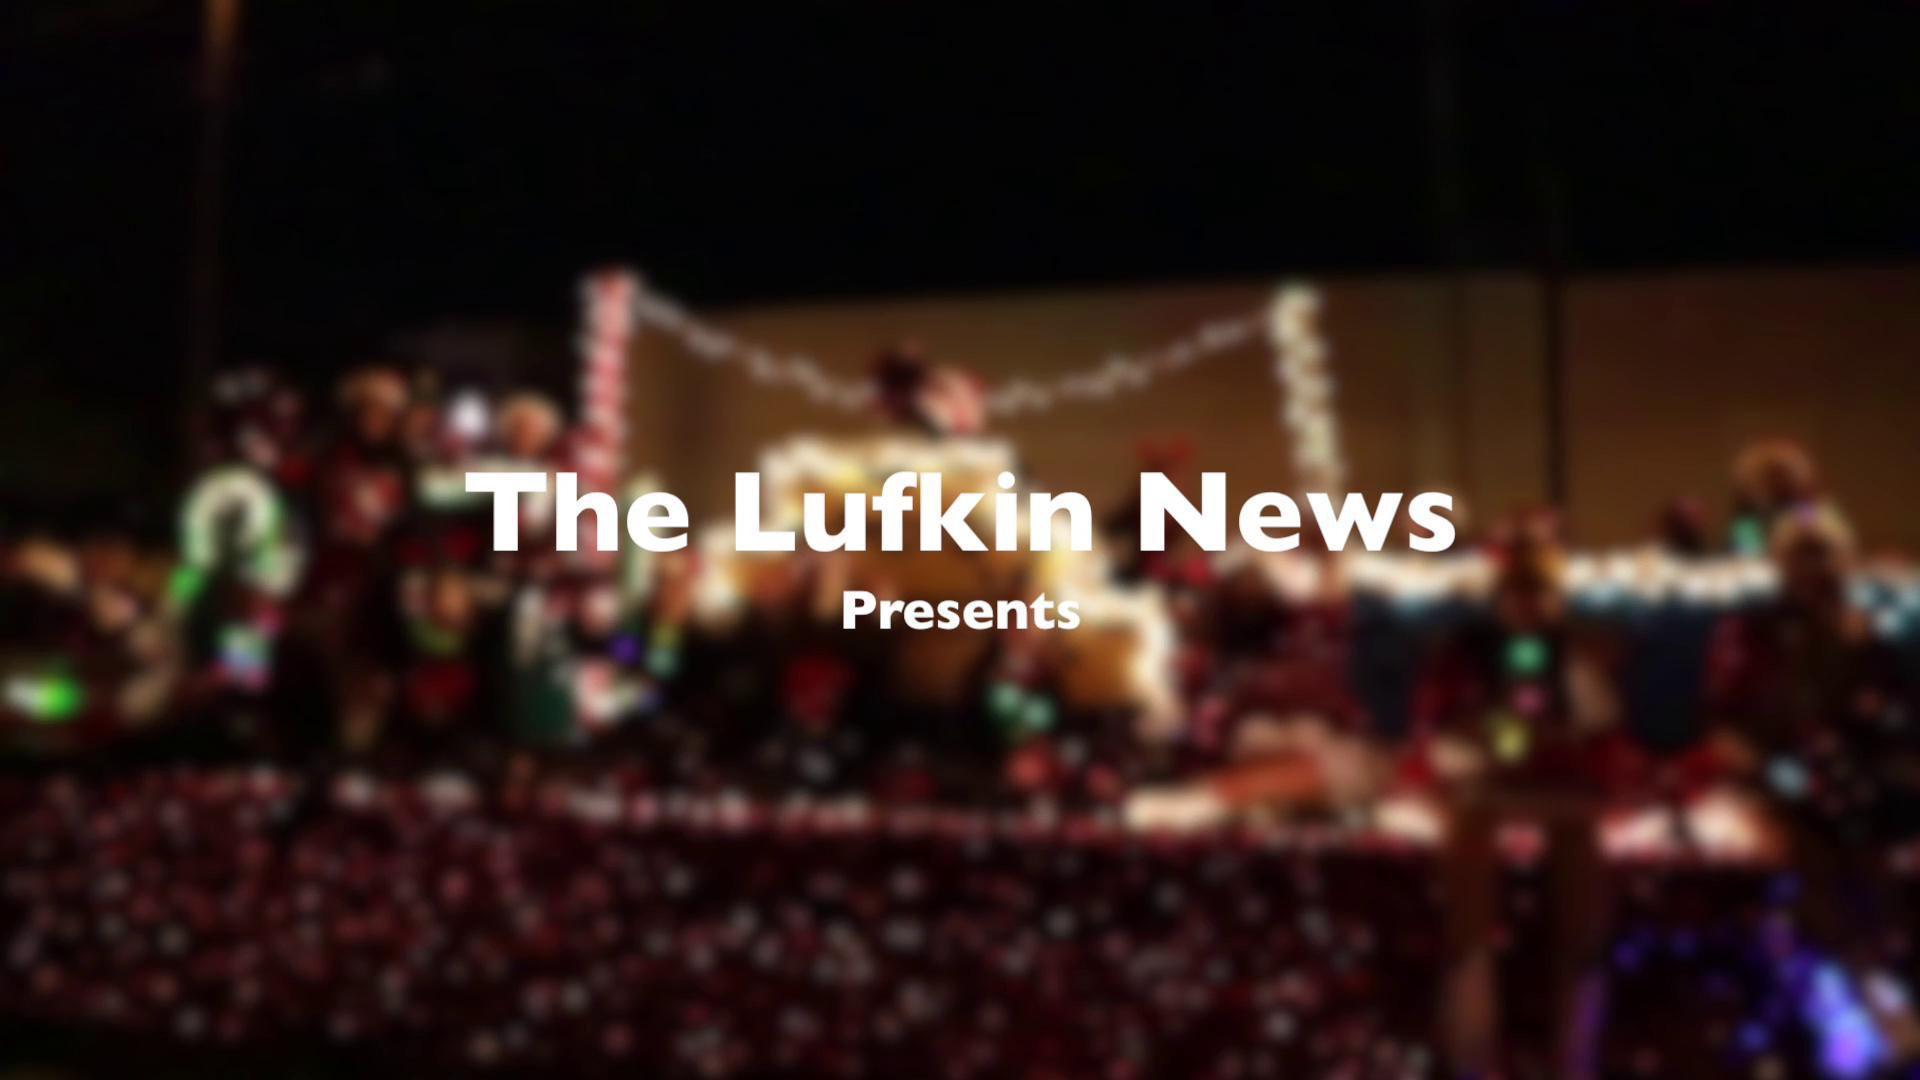 Lufkin Christmas Parade 2019 Main Street Lufkin Lighted Christmas Parade | | lufkindailynews.com